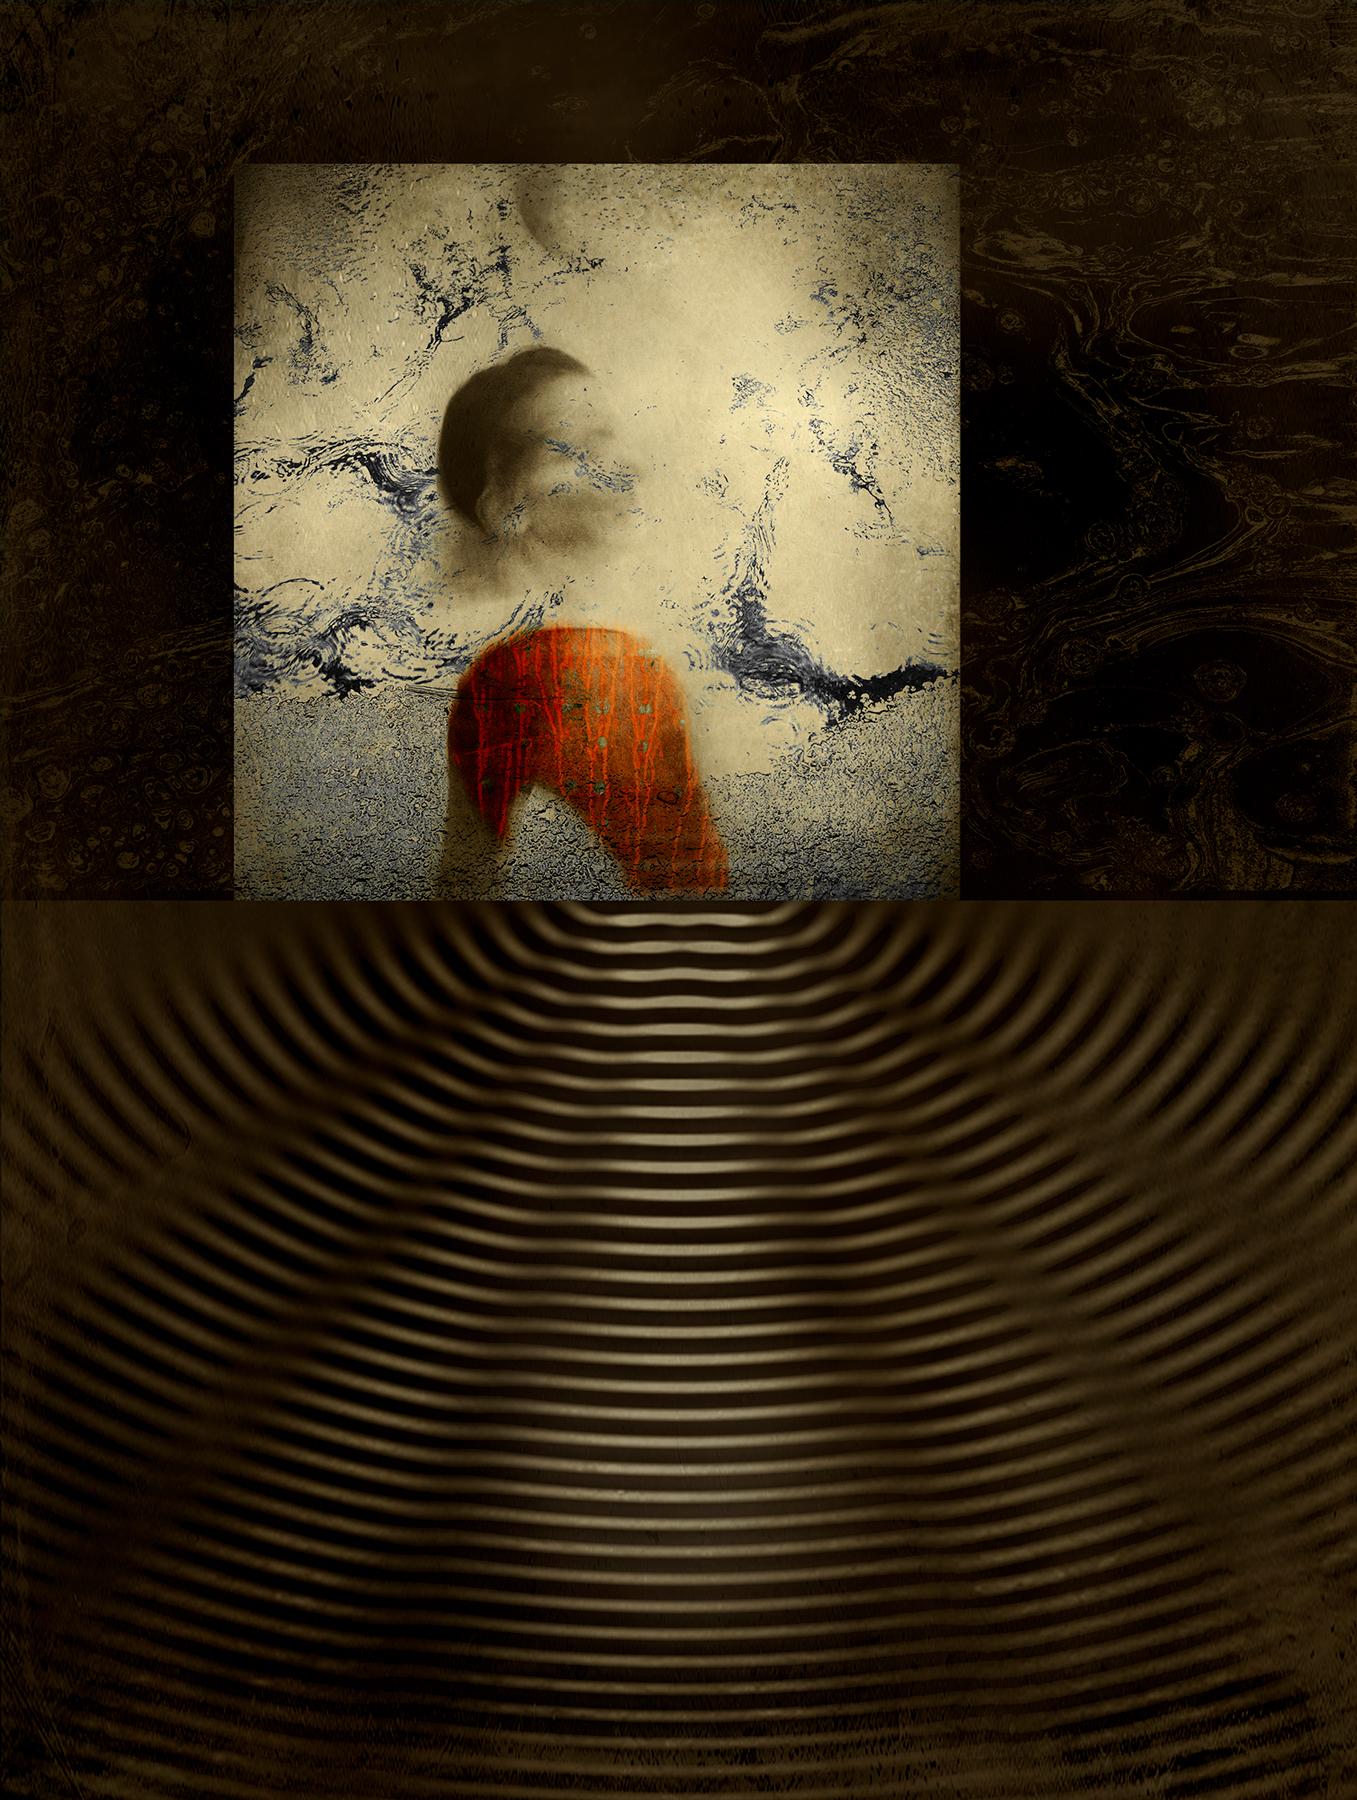 Eduardo_Fujii_Uncertain-Nature-of-Reality_Interference-Pattern_02.jpg